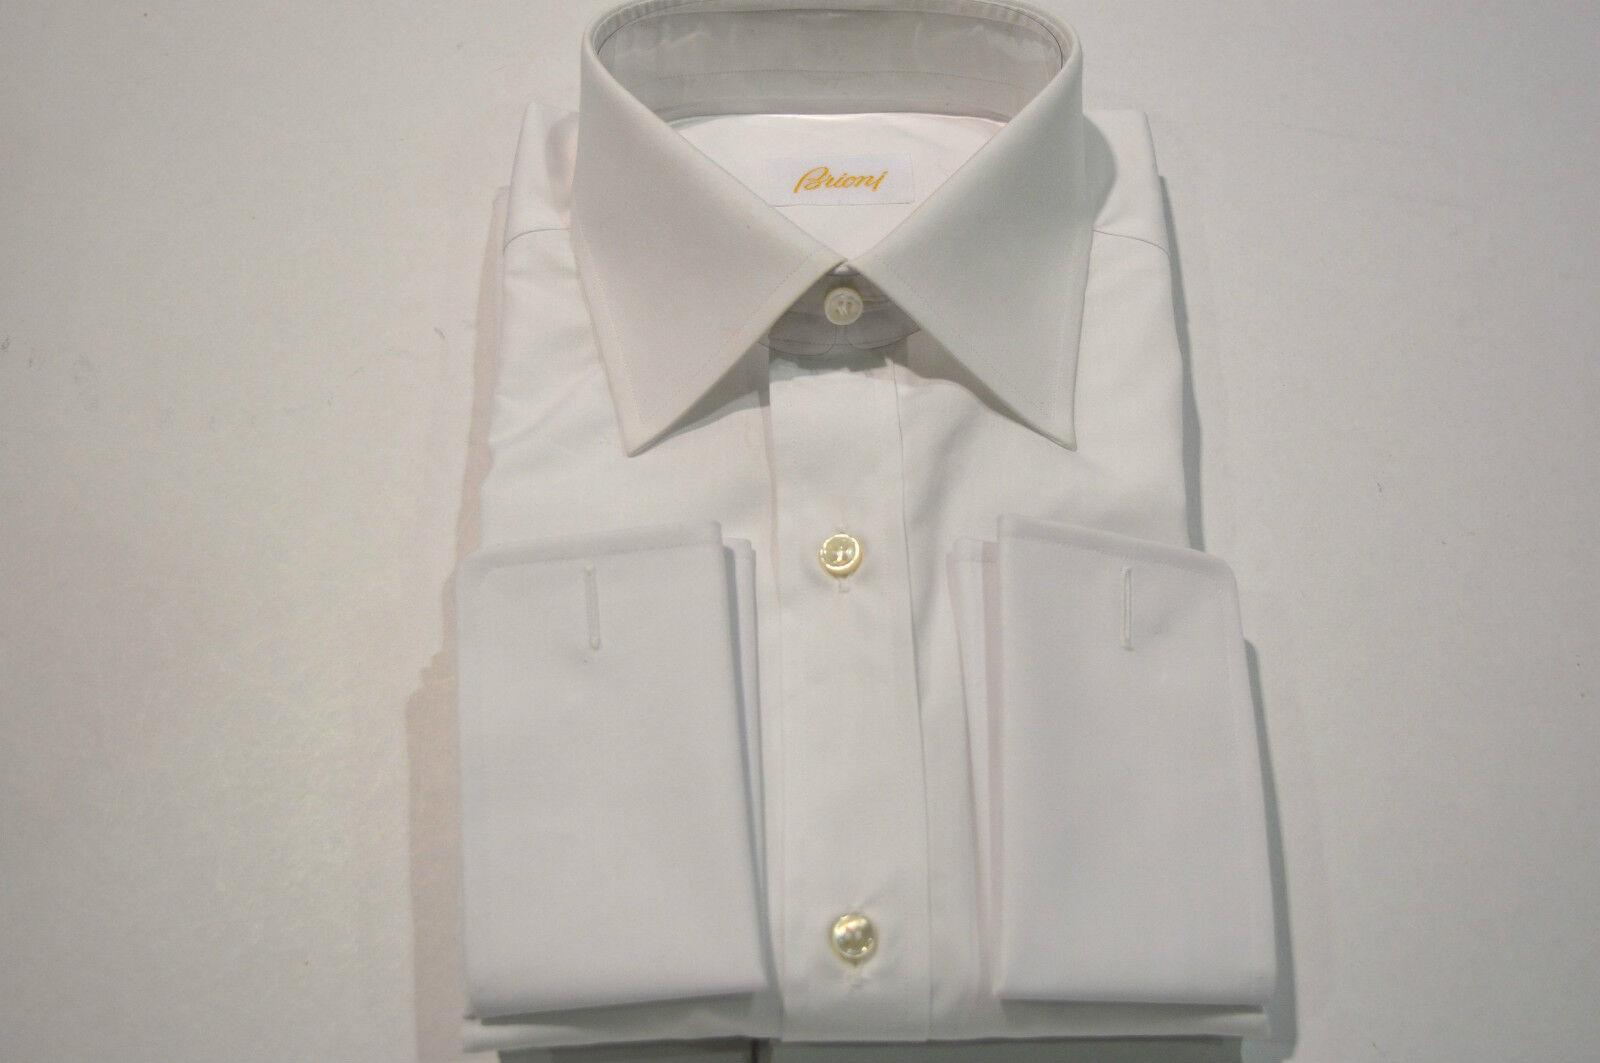 NEW  BRIONI Dress hemd 100% baumwolle Größe 17.75  Us 45  Eu (Cod GE 1)